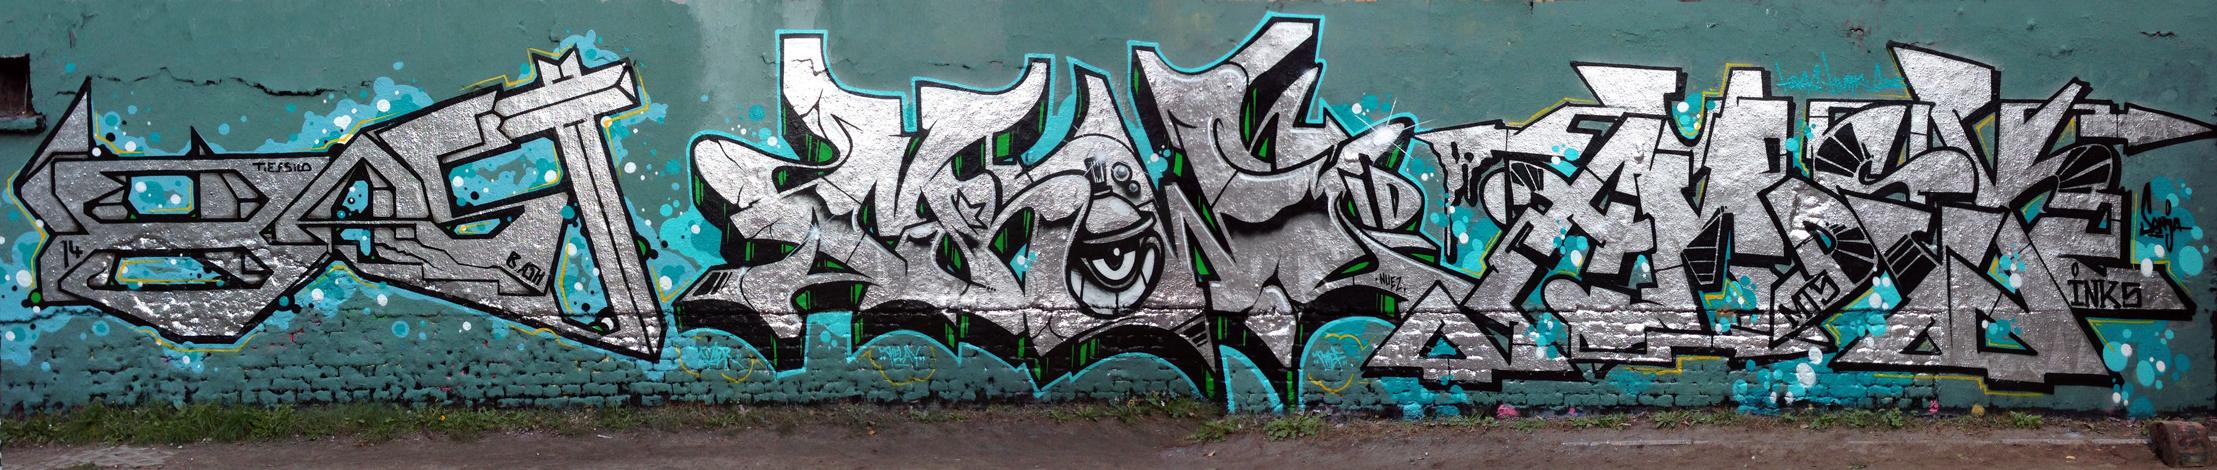 14.-B.ash-KidCrow-Amosk_2013_web